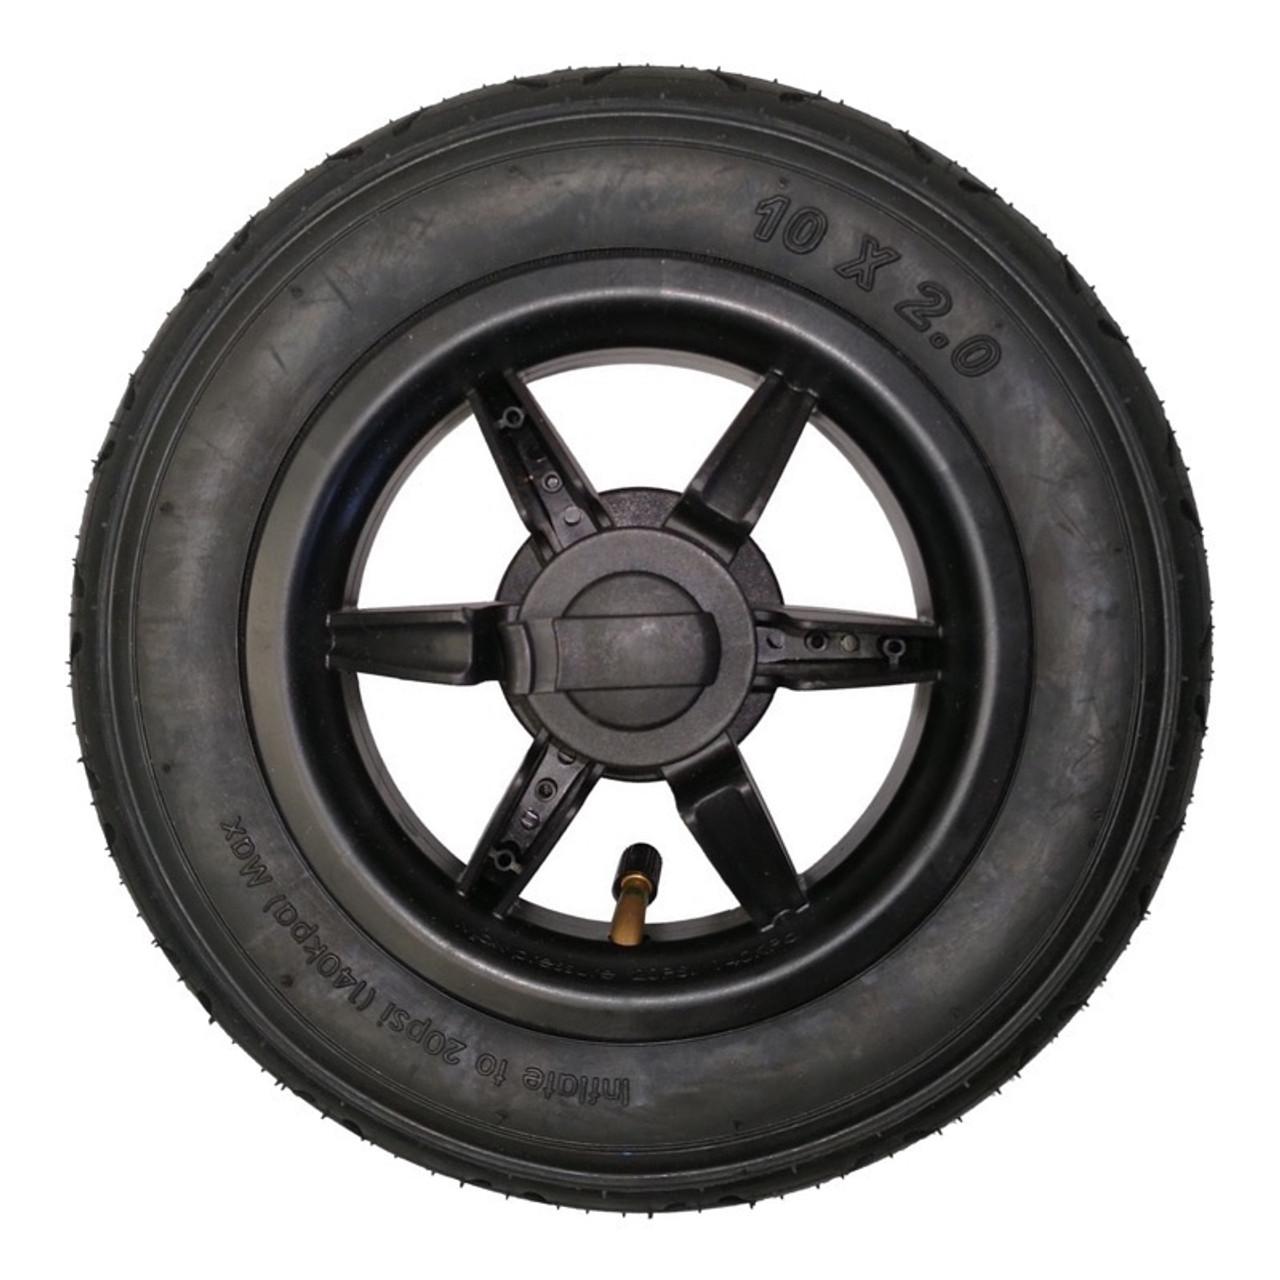 "Mountain Buggy 10"" Complete Rear Wheel (2010-2014 models)"